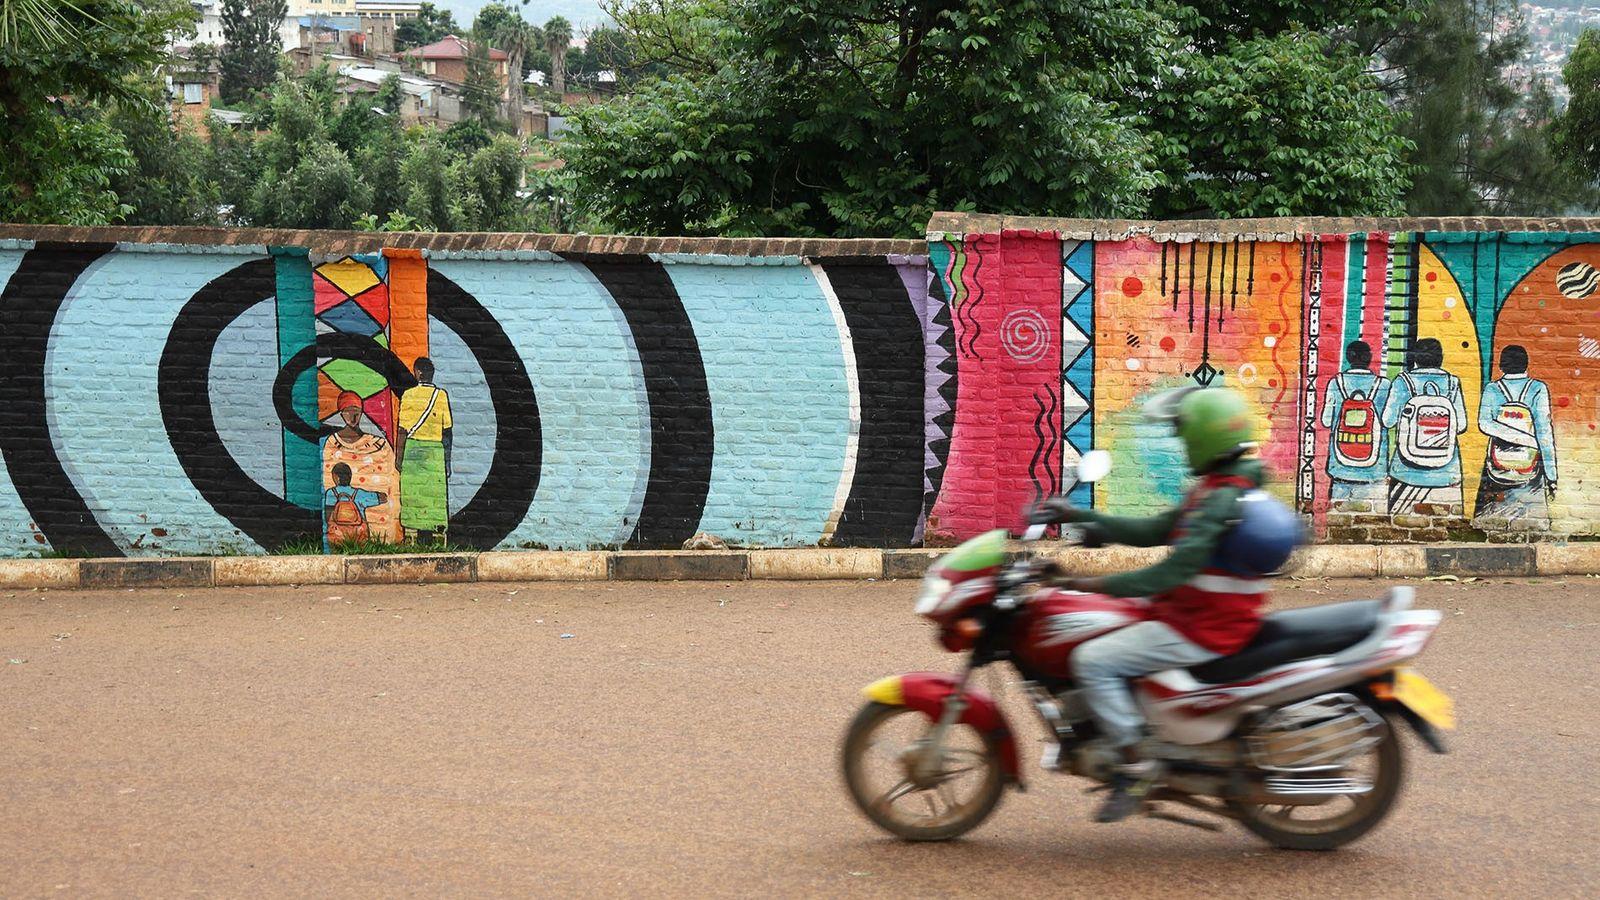 Street art facilitated by Kurema, Kureba, Kwiga.